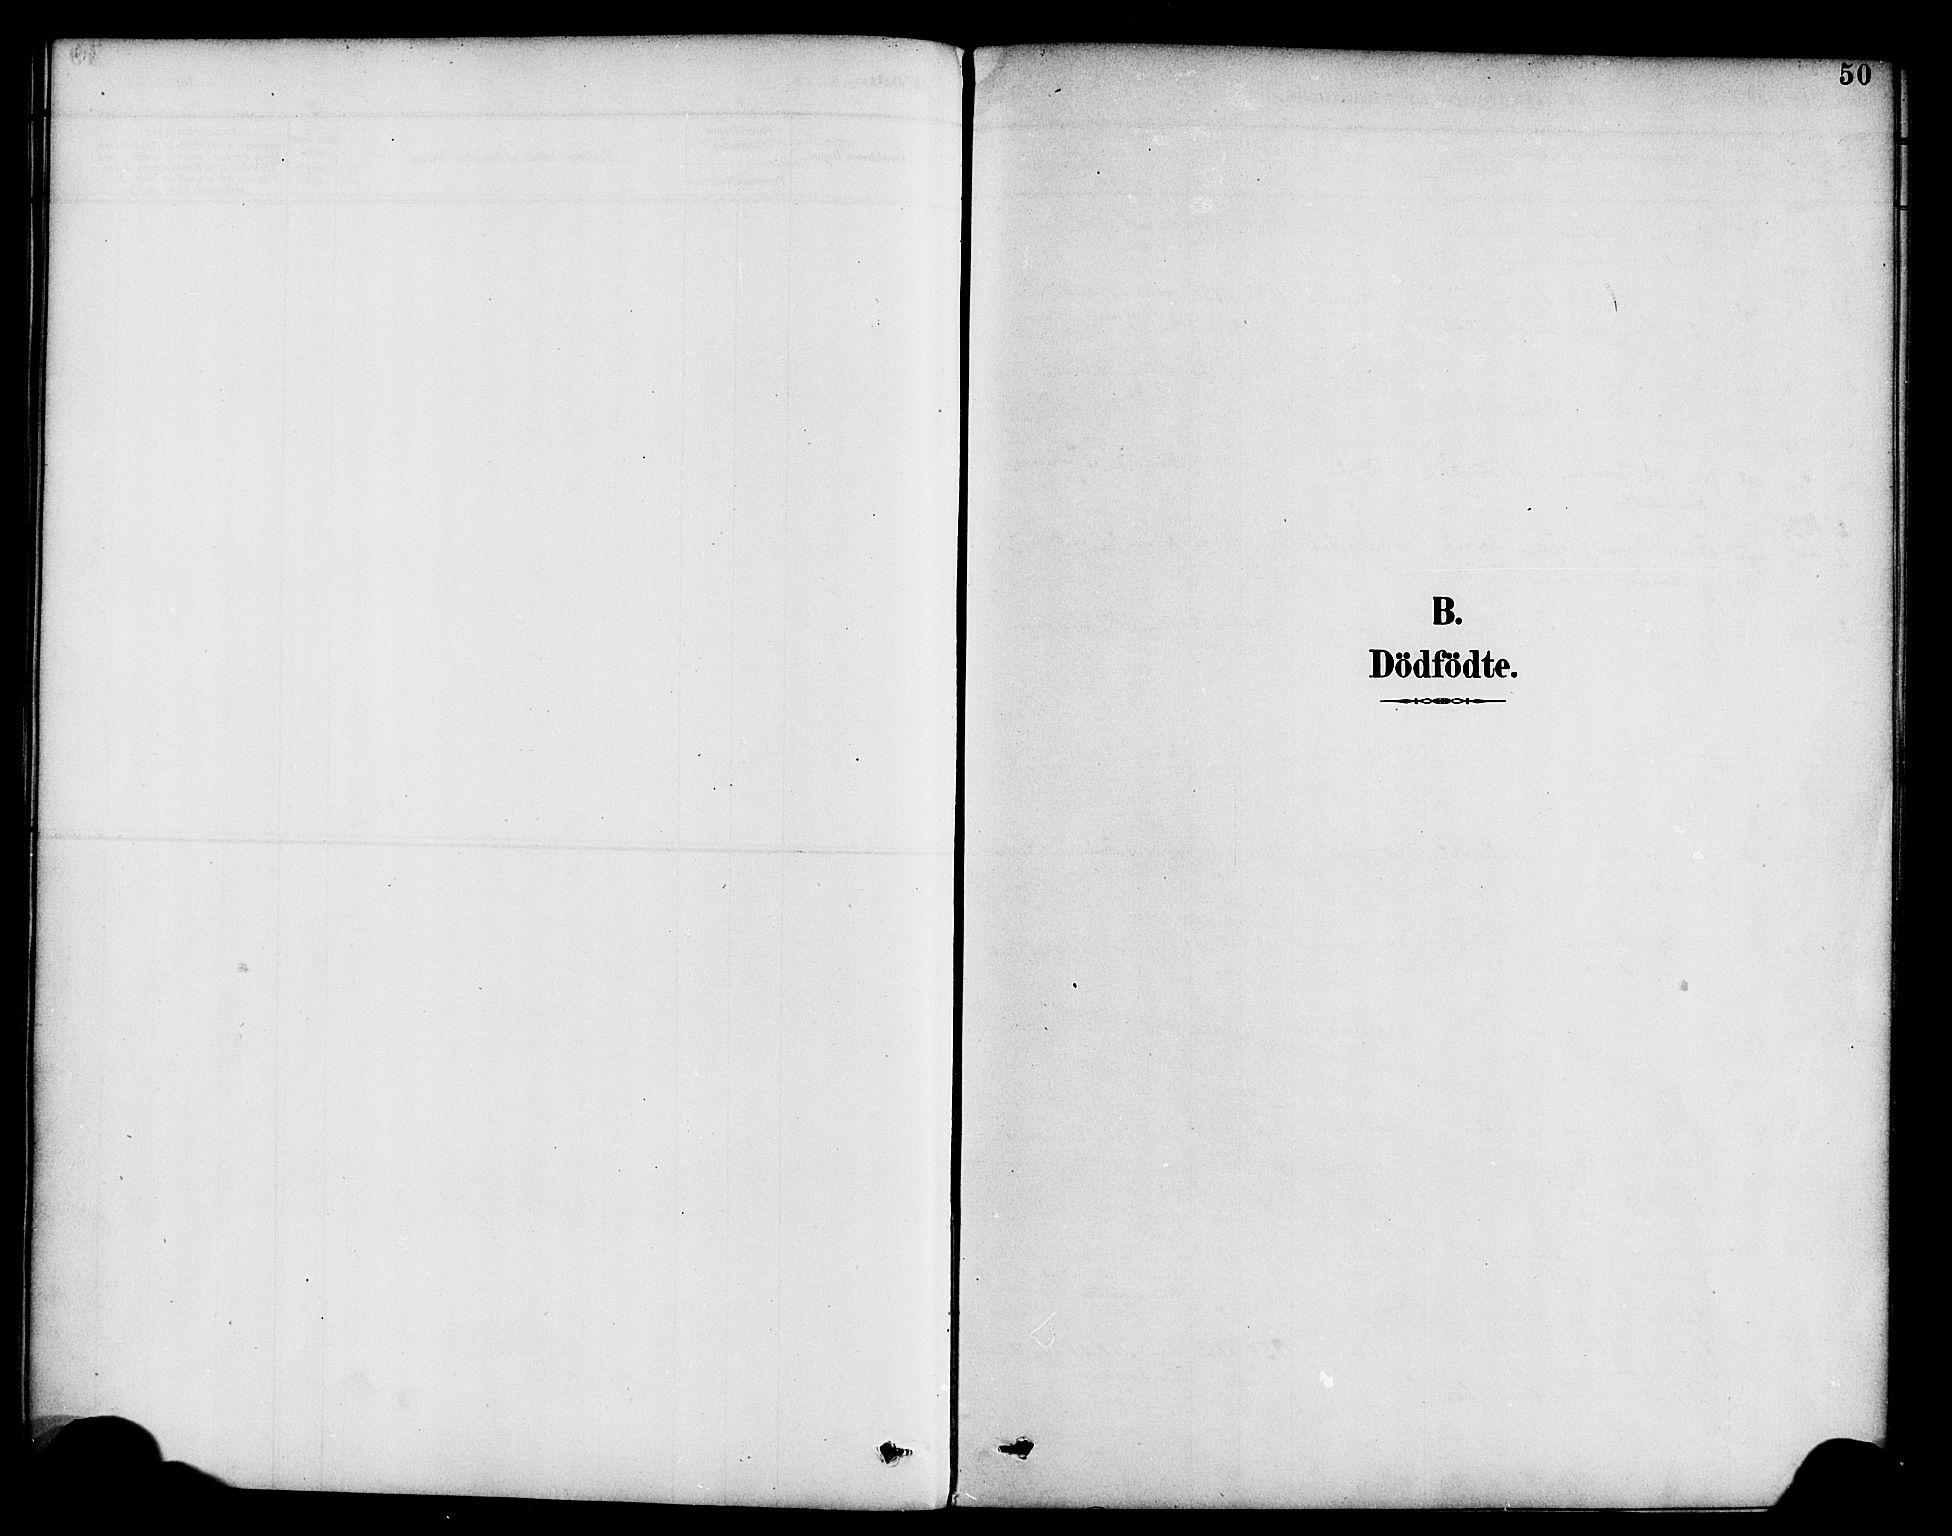 SAB, Hyllestad Sokneprestembete, Ministerialbok nr. B 1, 1886-1904, s. 50